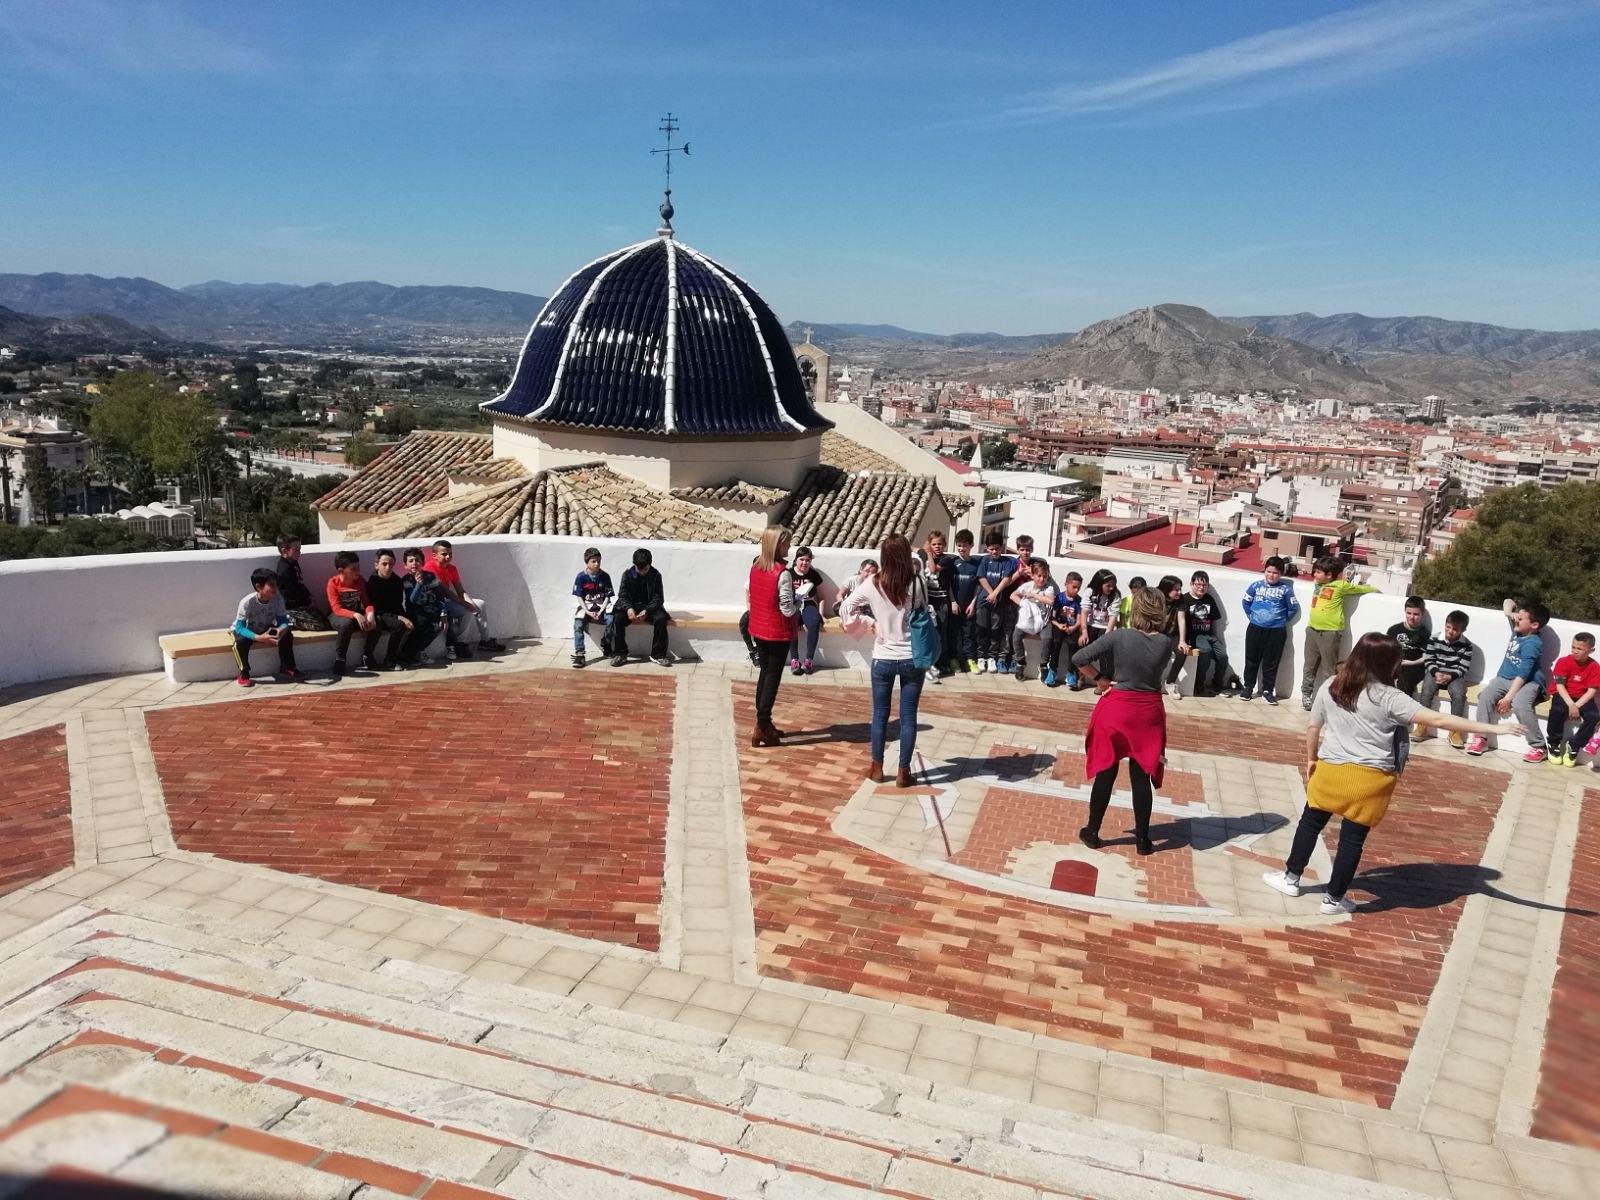 (2018-04-18) - Visita ermita alumnos Beatriz-Carmina-Lucía,3º,La Foia - María Isabel Berenguer Brotons - (02)